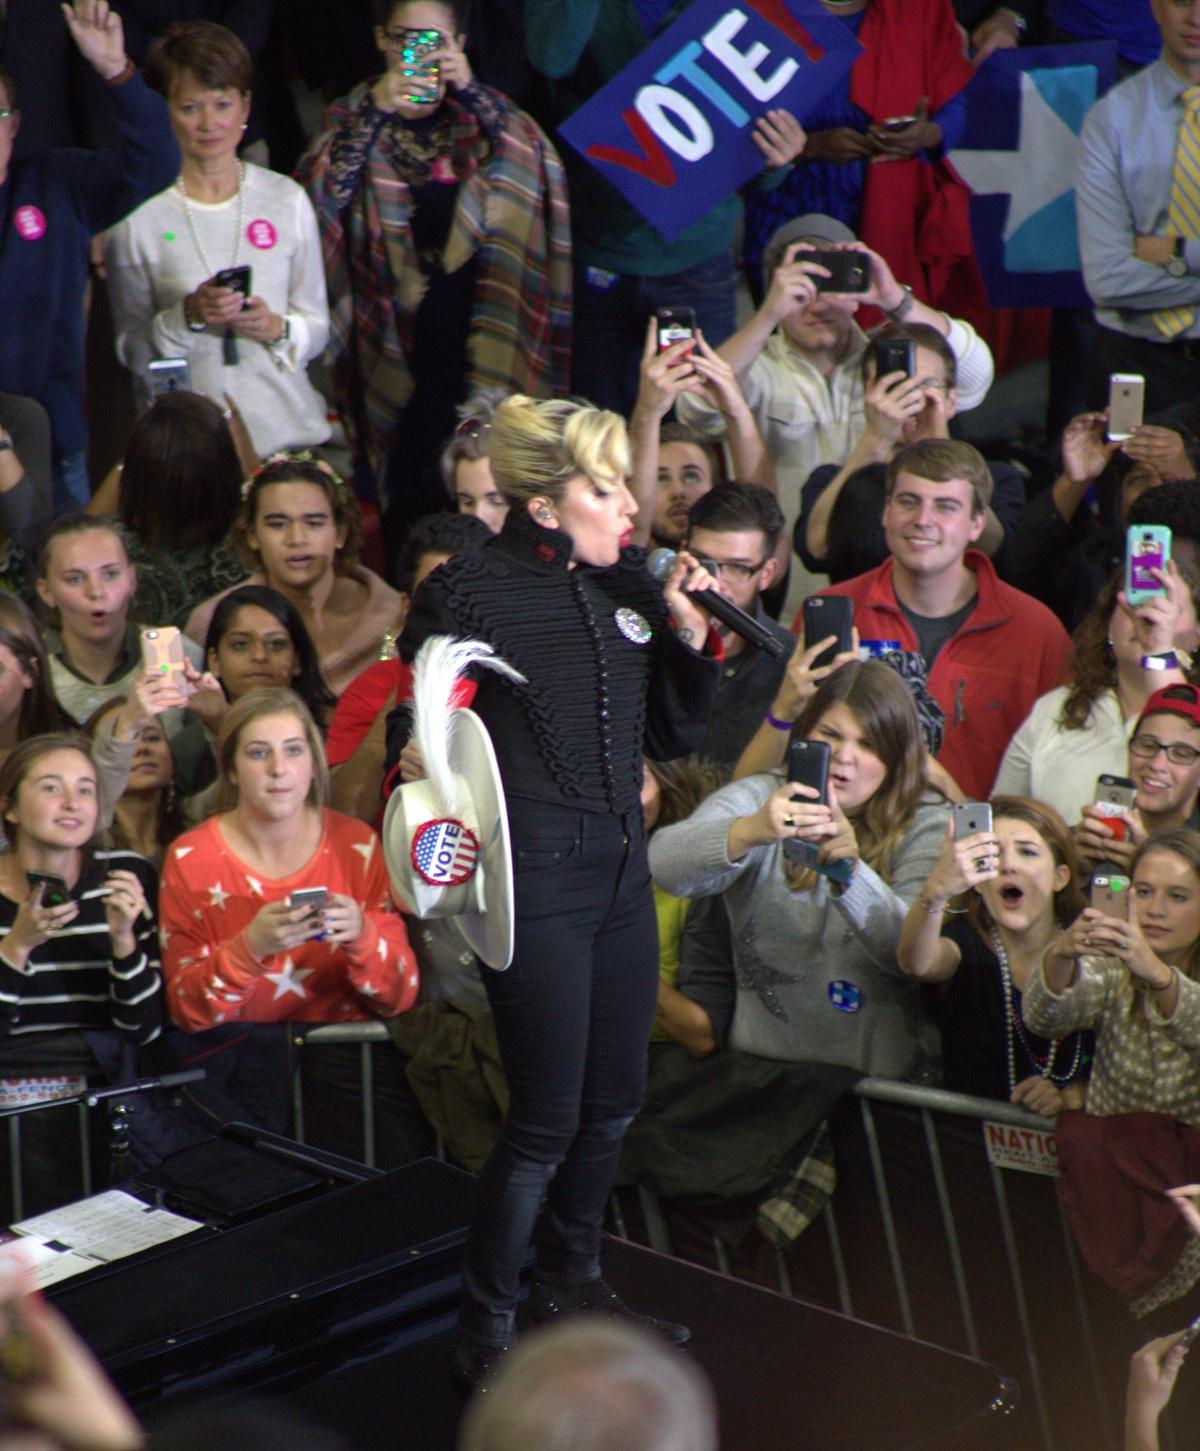 Event ~ North Carolina State University [NCSU], Raleigh, North Carolina–Lady Gaga,11/07